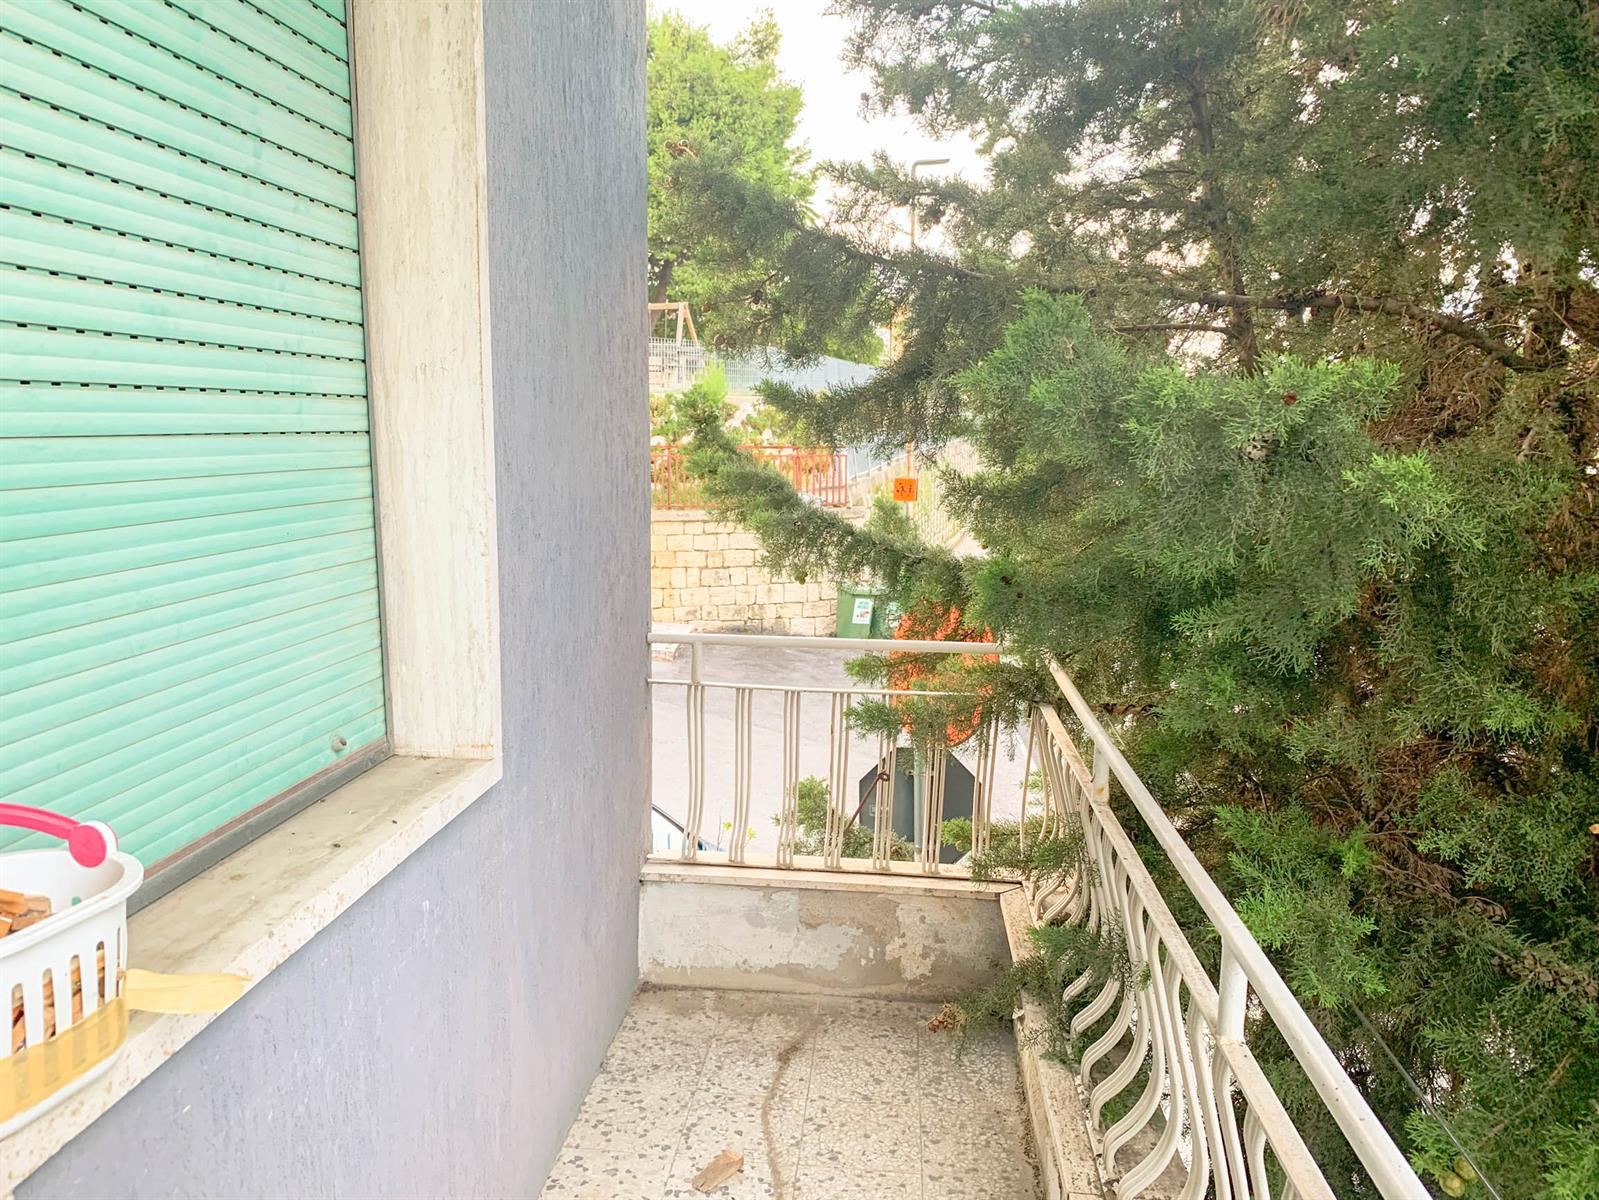 Immeuble à appartements - Ascoli Piceno - #3994126-22